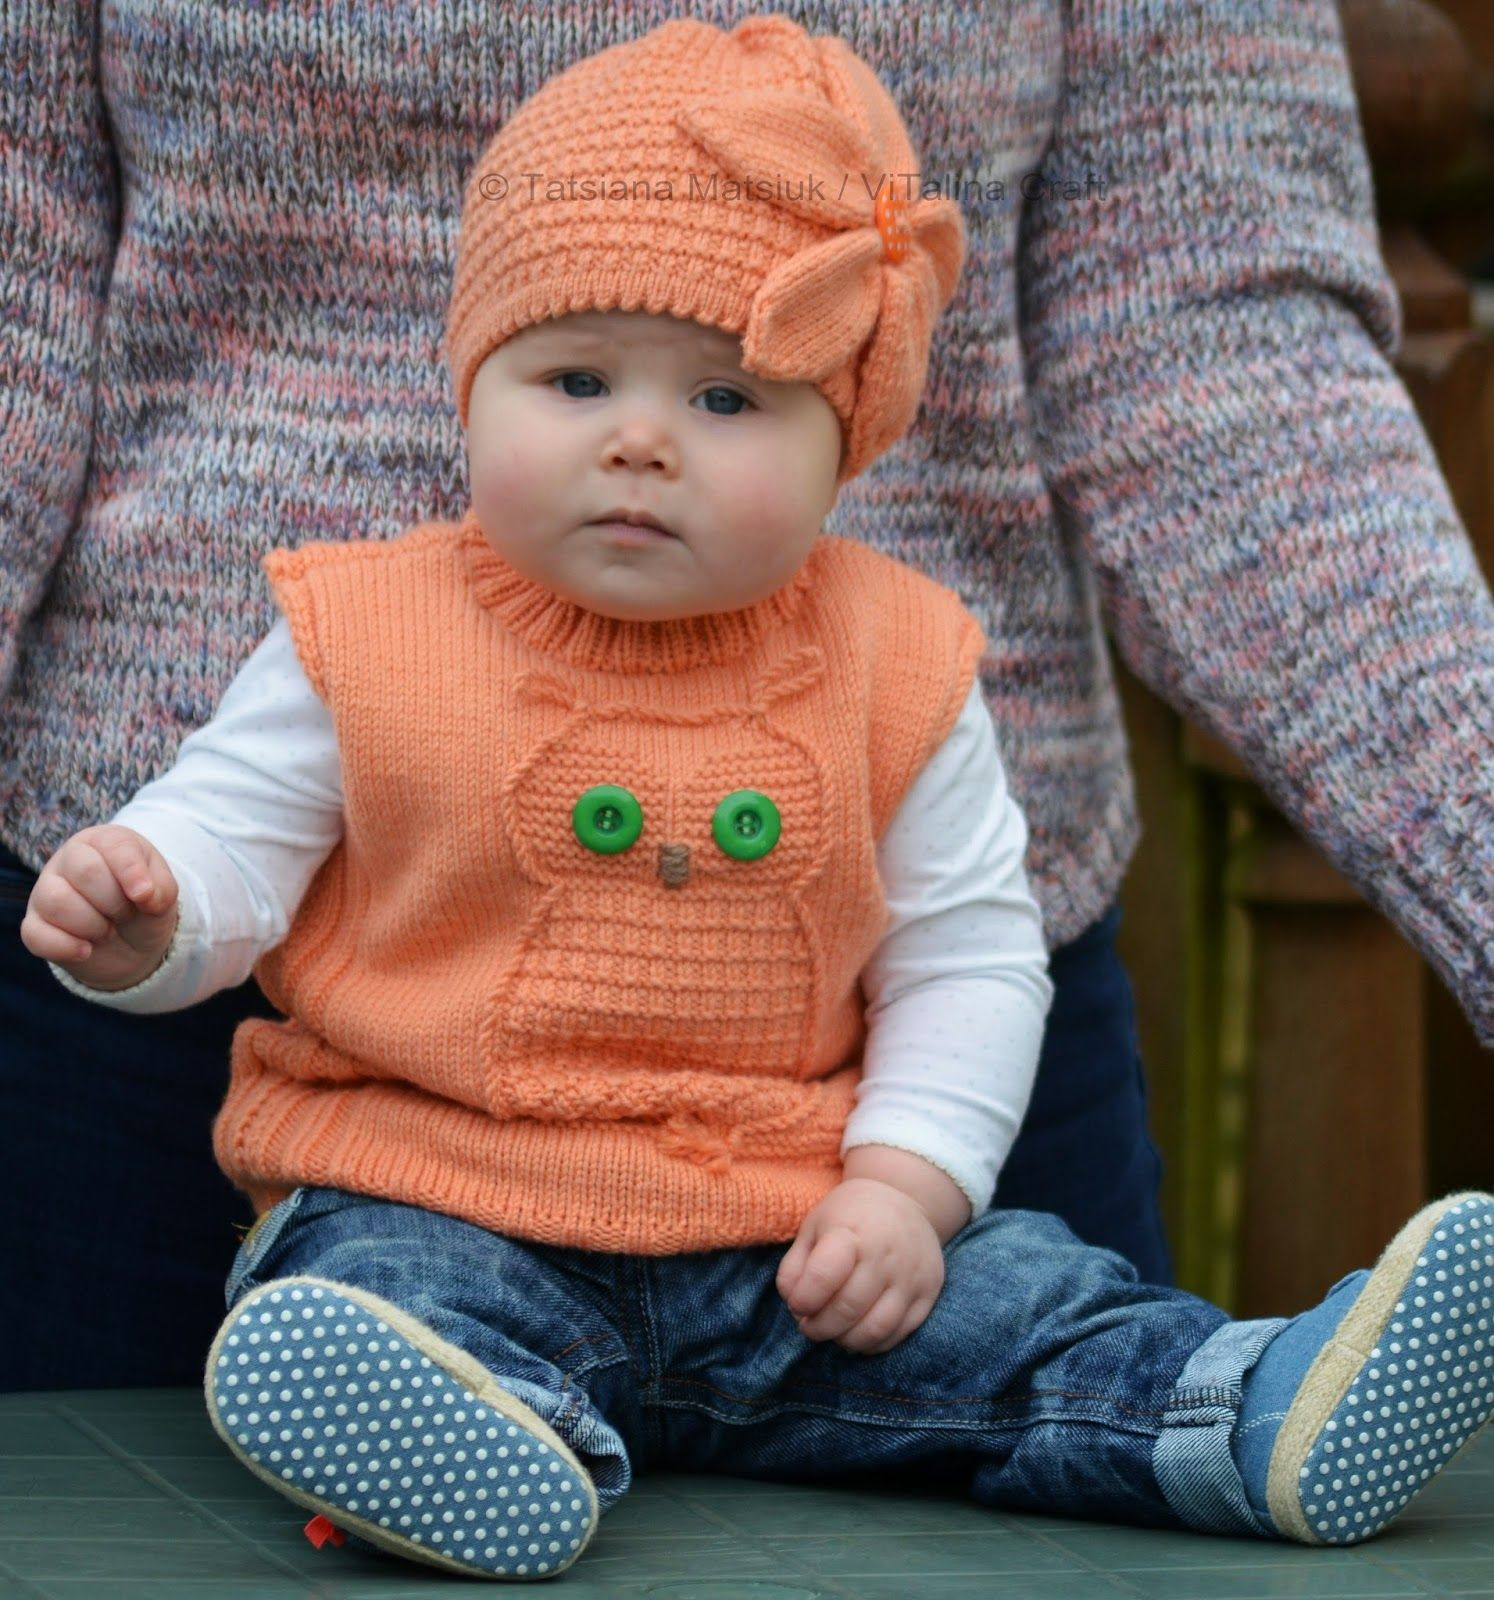 ViTalina Craft: Wise Owl Baby Vest Knitting Pattern | Knitting for ...